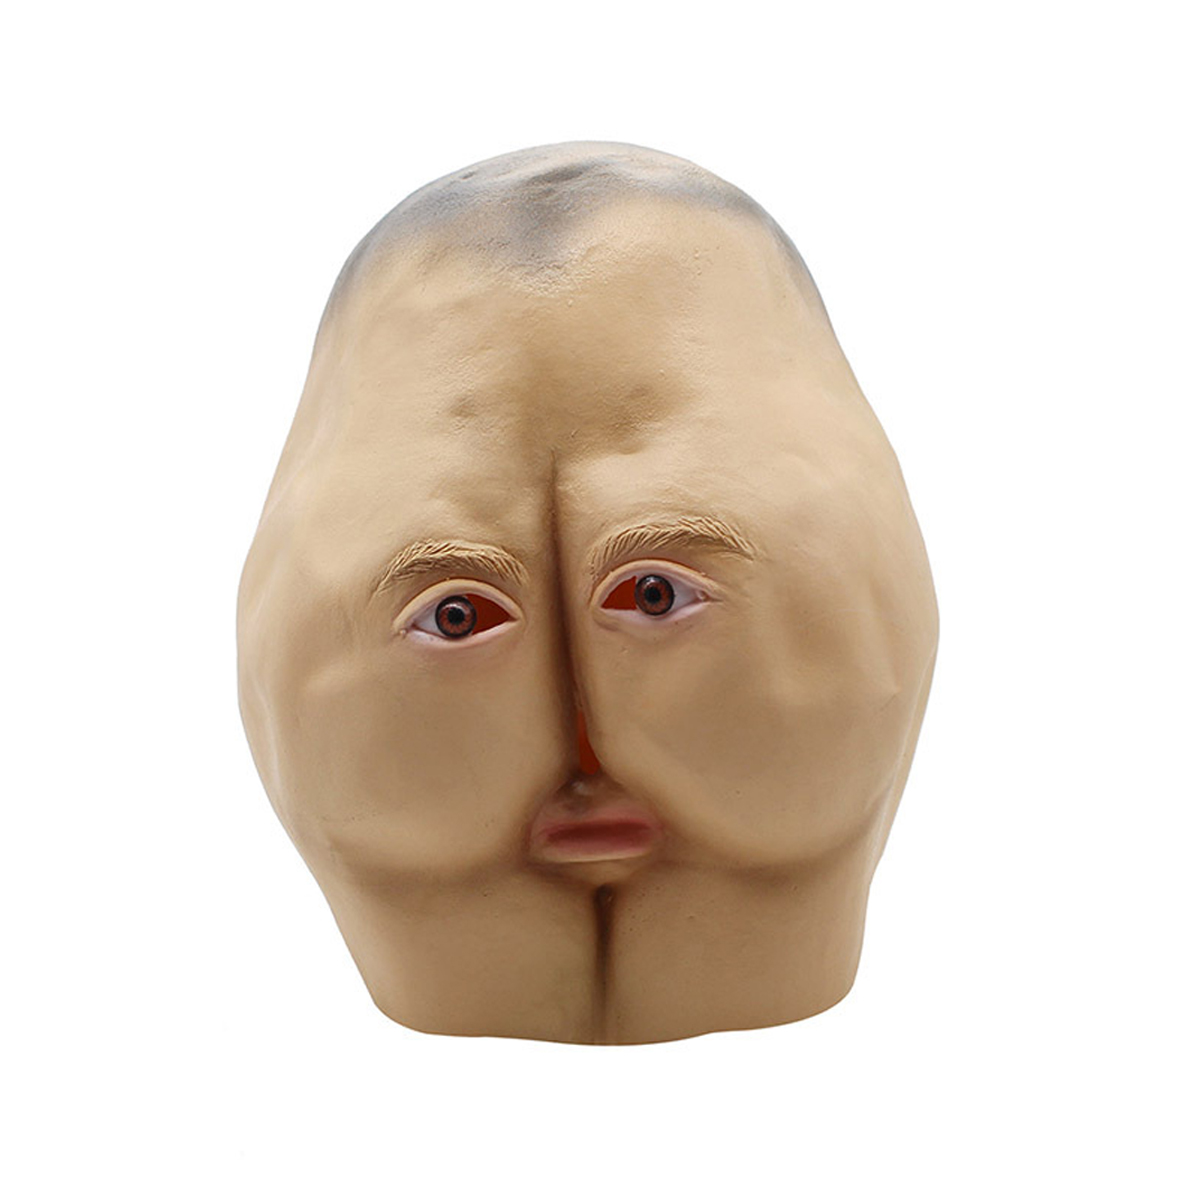 Latex Butt Head Mask Adult Ass Halloween Party Costume